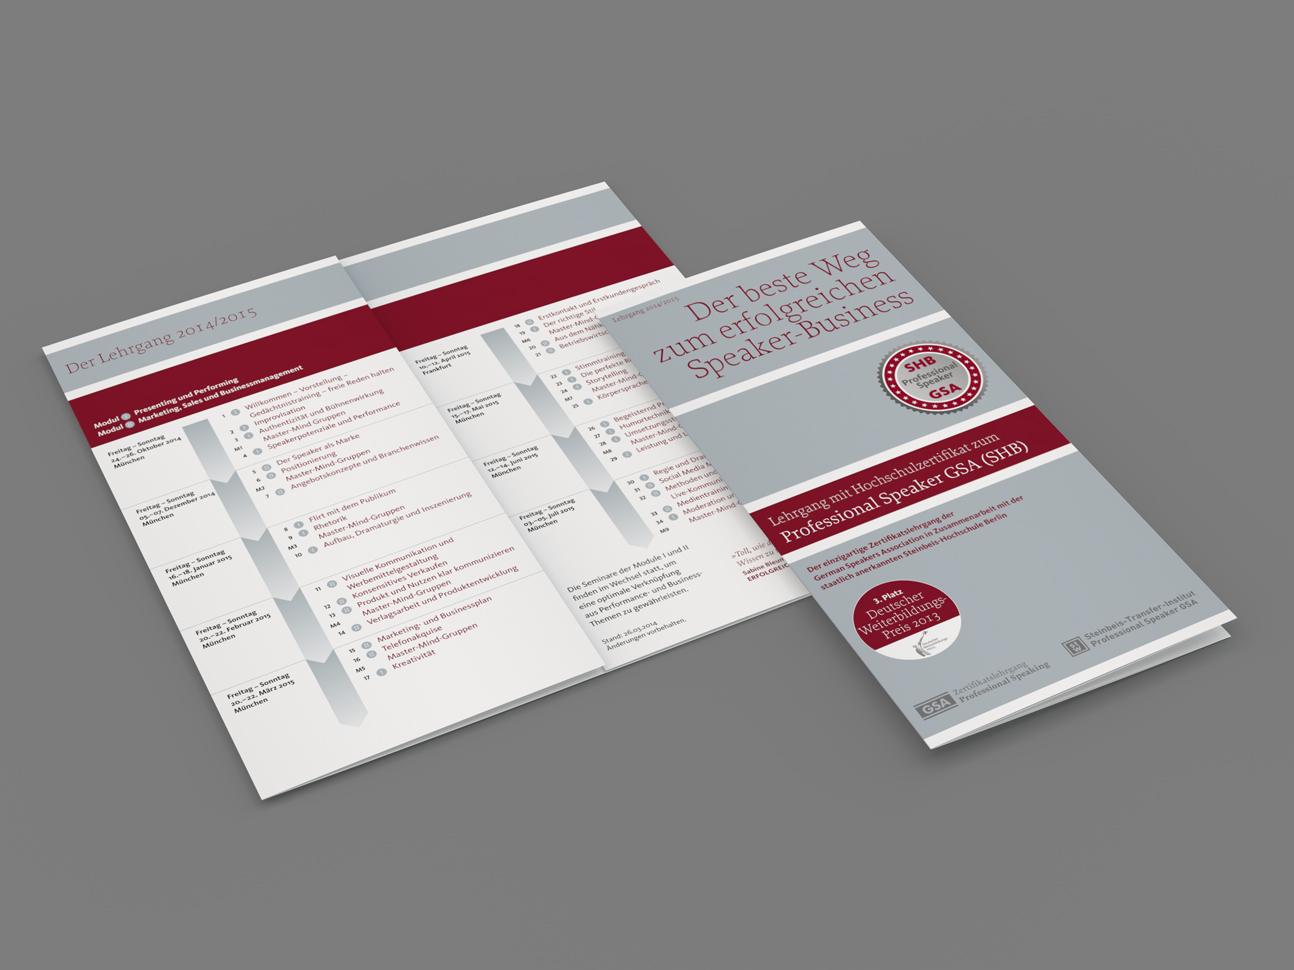 martin_zech_design_projekt_design_german_speakers_association_lehrgang_flyer